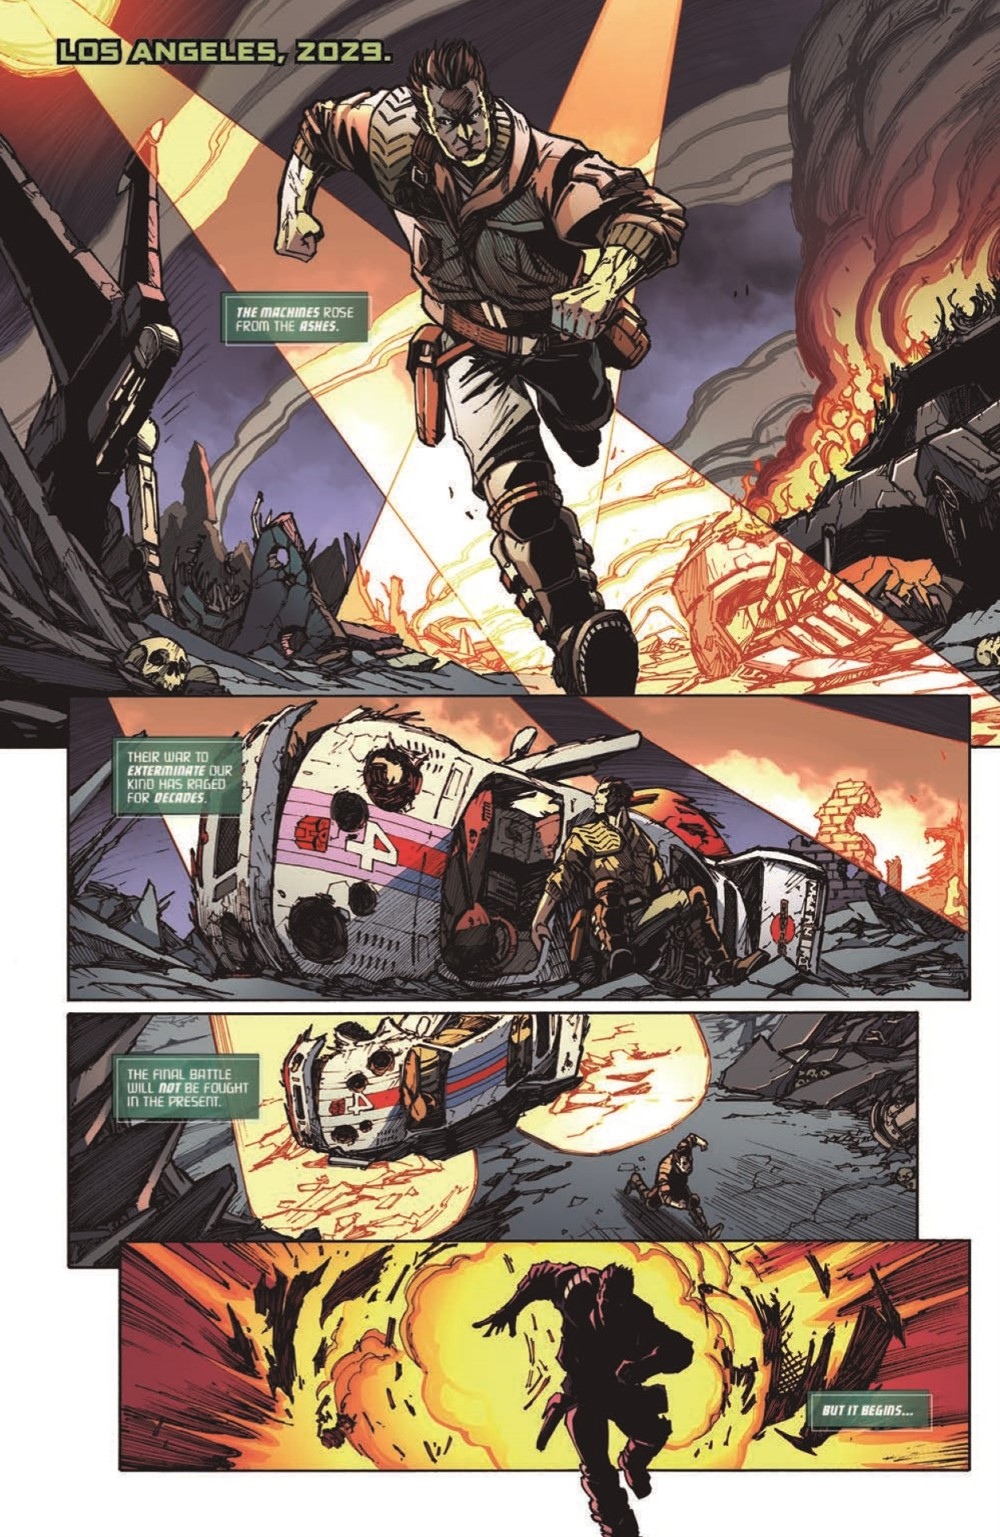 TF-vs-TERMINATOR-pr-4 ComicList Previews: TRANSFORMERS VS THE TERMINATOR ENEMY OF MY ENEMY TP